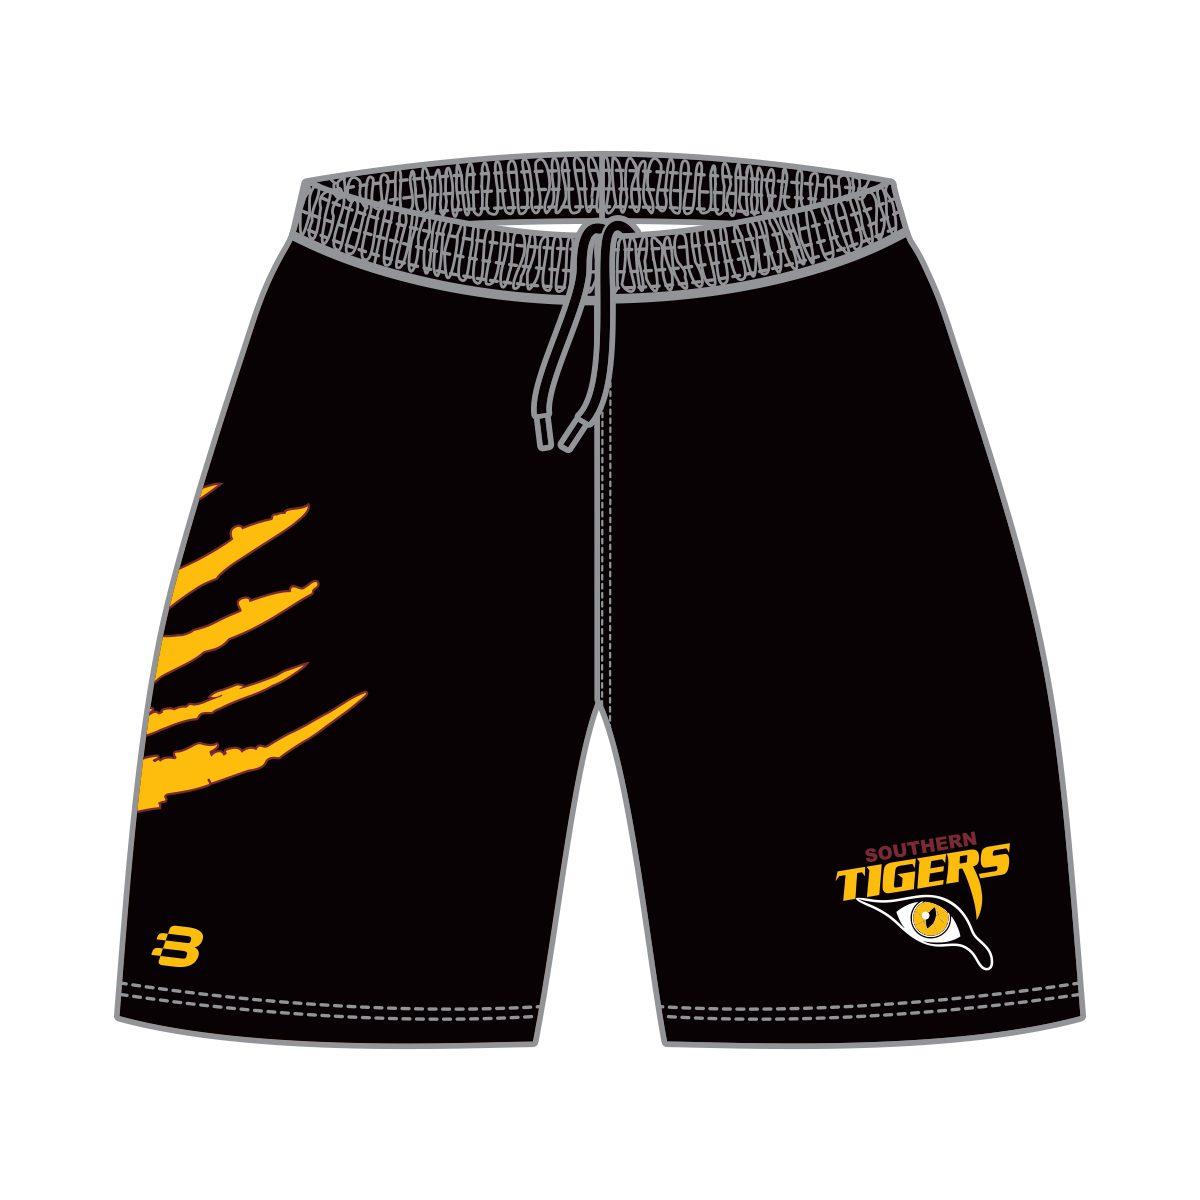 Southern Tigers Mens Basketball Shorts - Black - Blackchrome